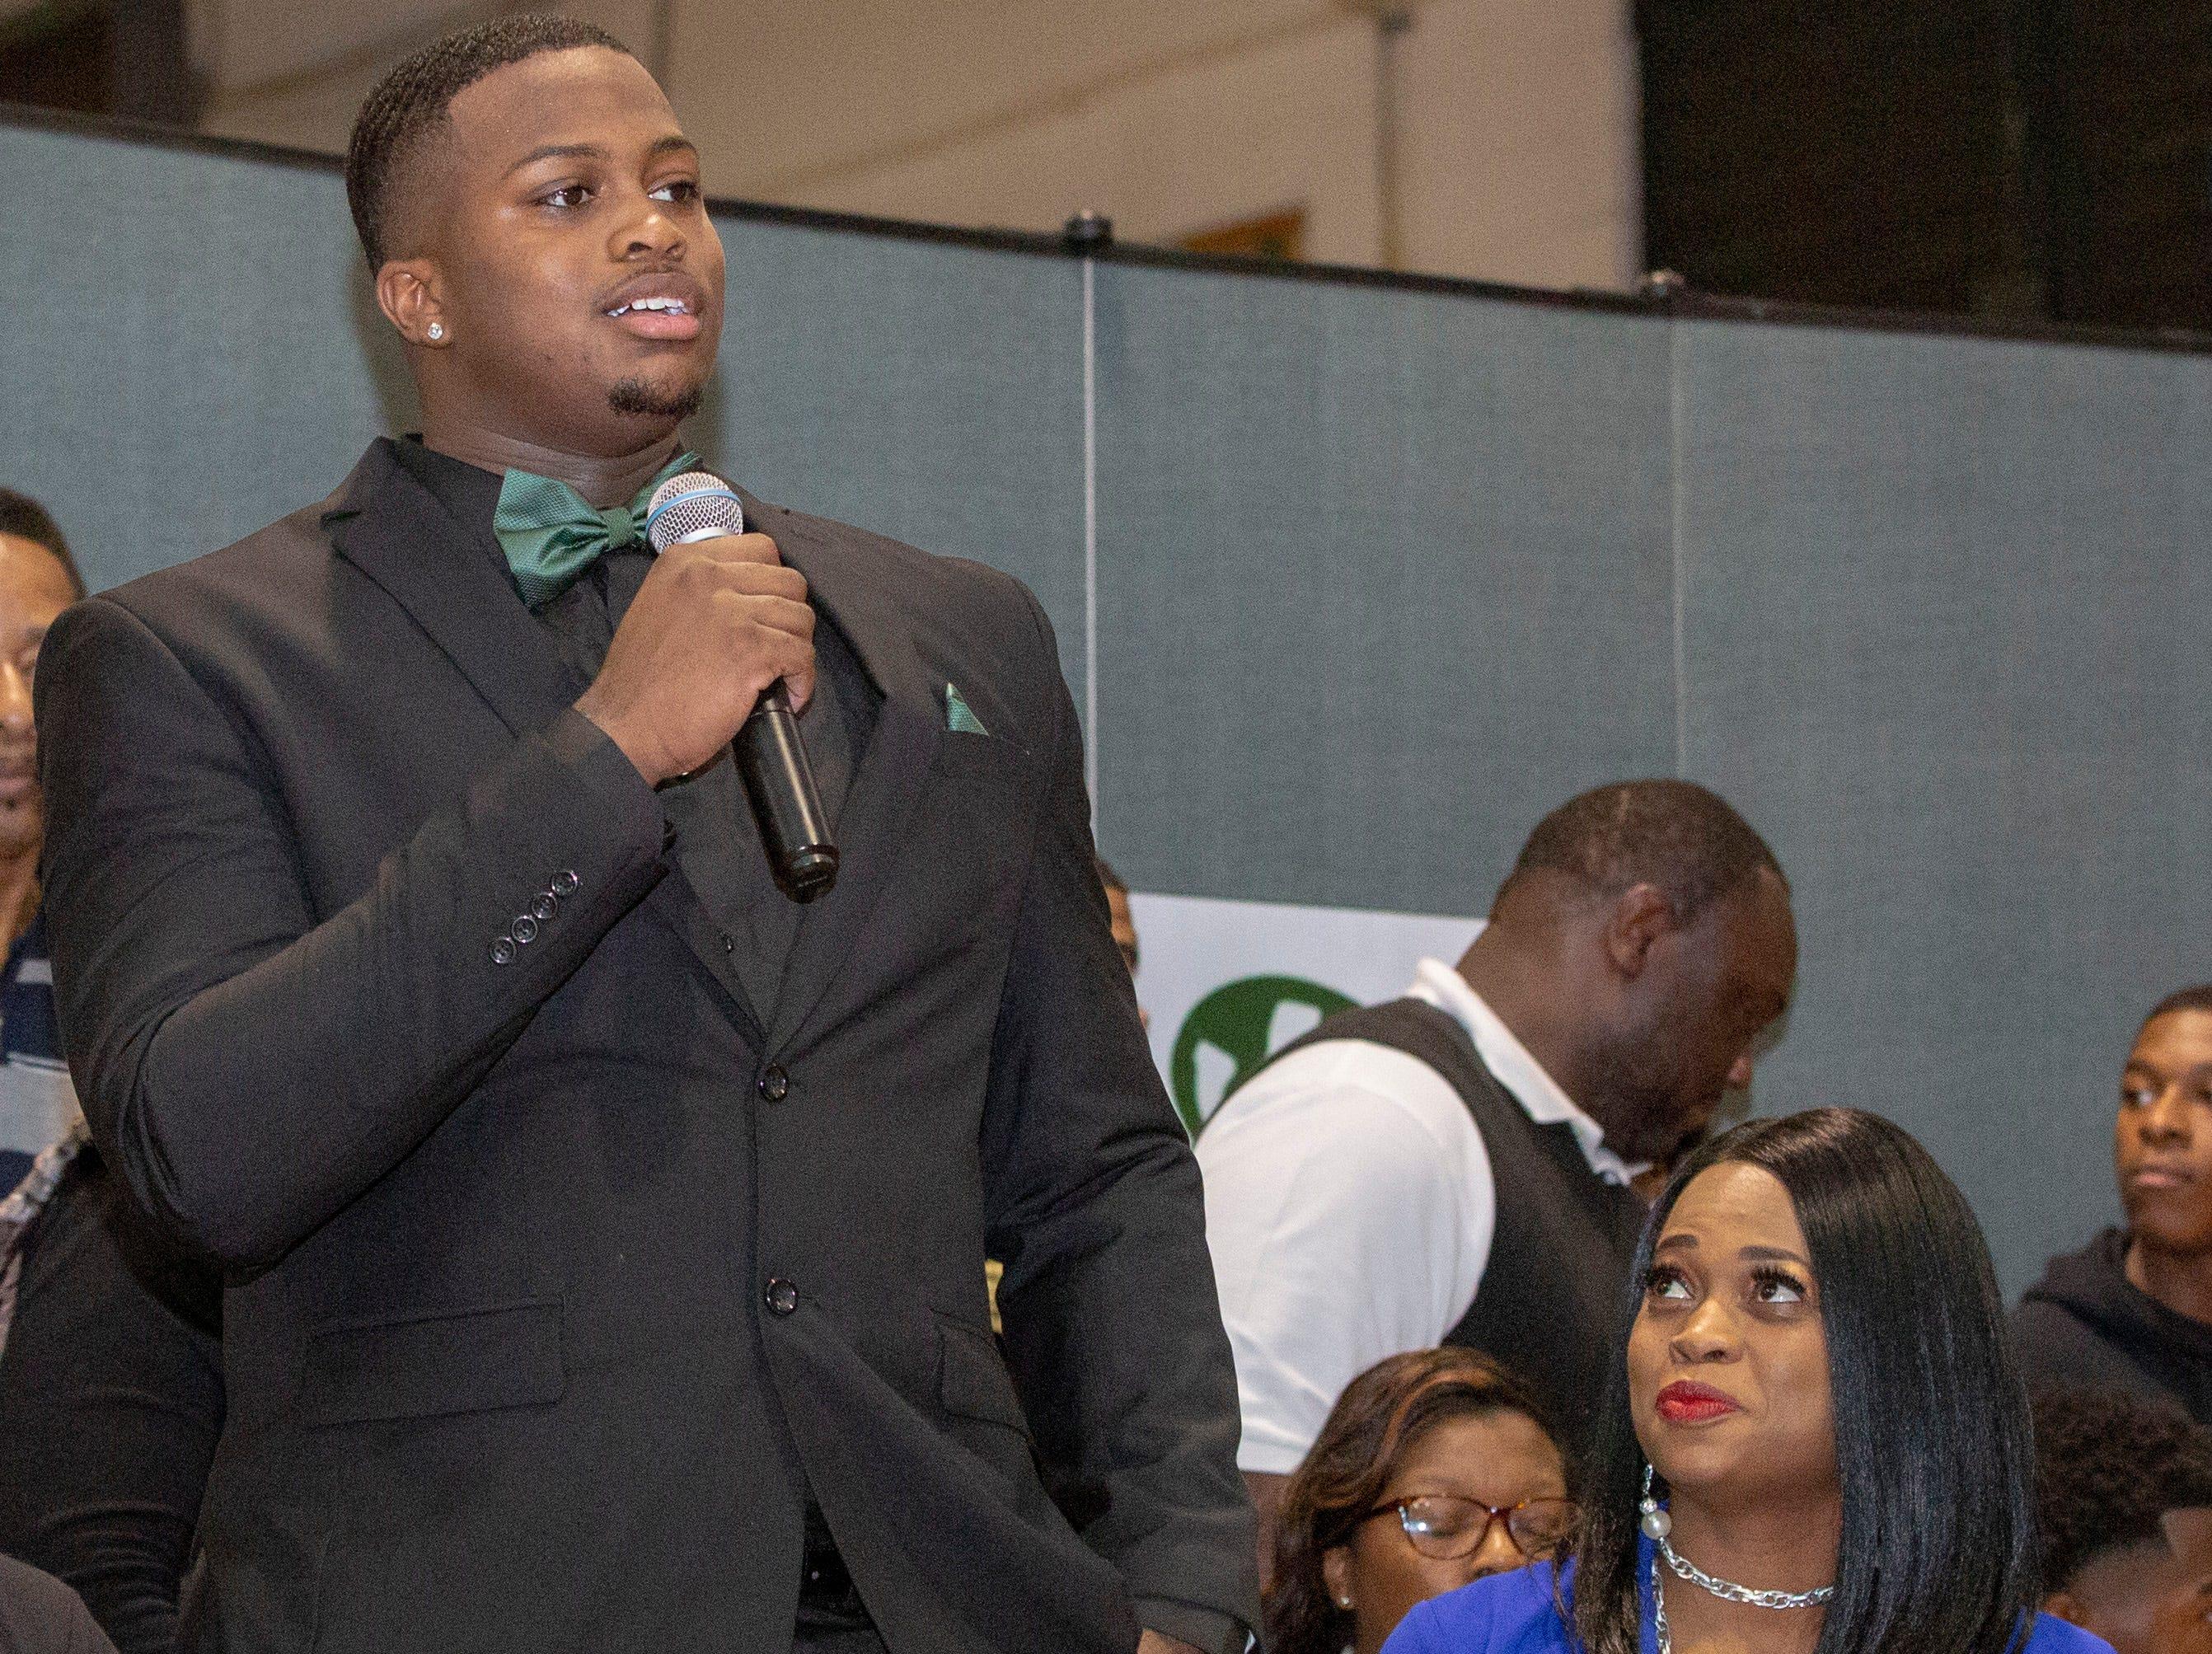 J'Shun Bodiford, a Jeff Davis High School senior, signed to play football at a community college.